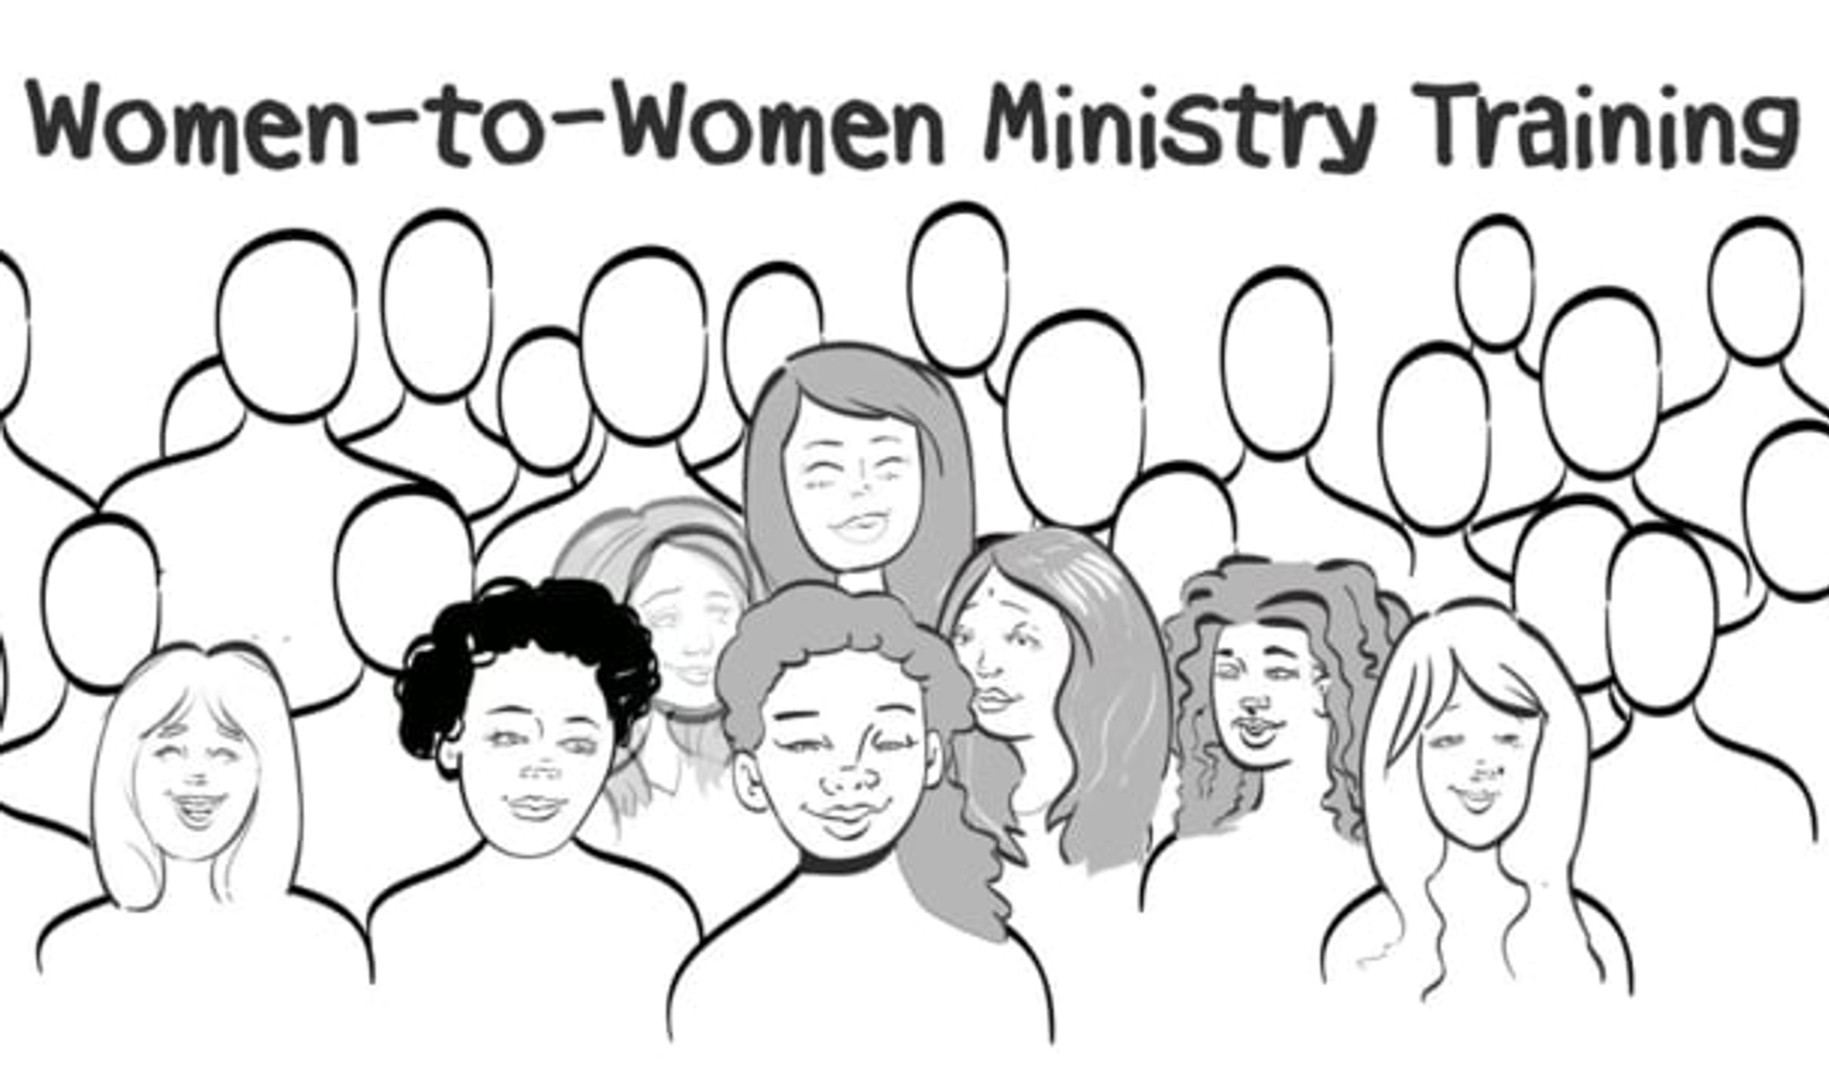 Why Train Women?